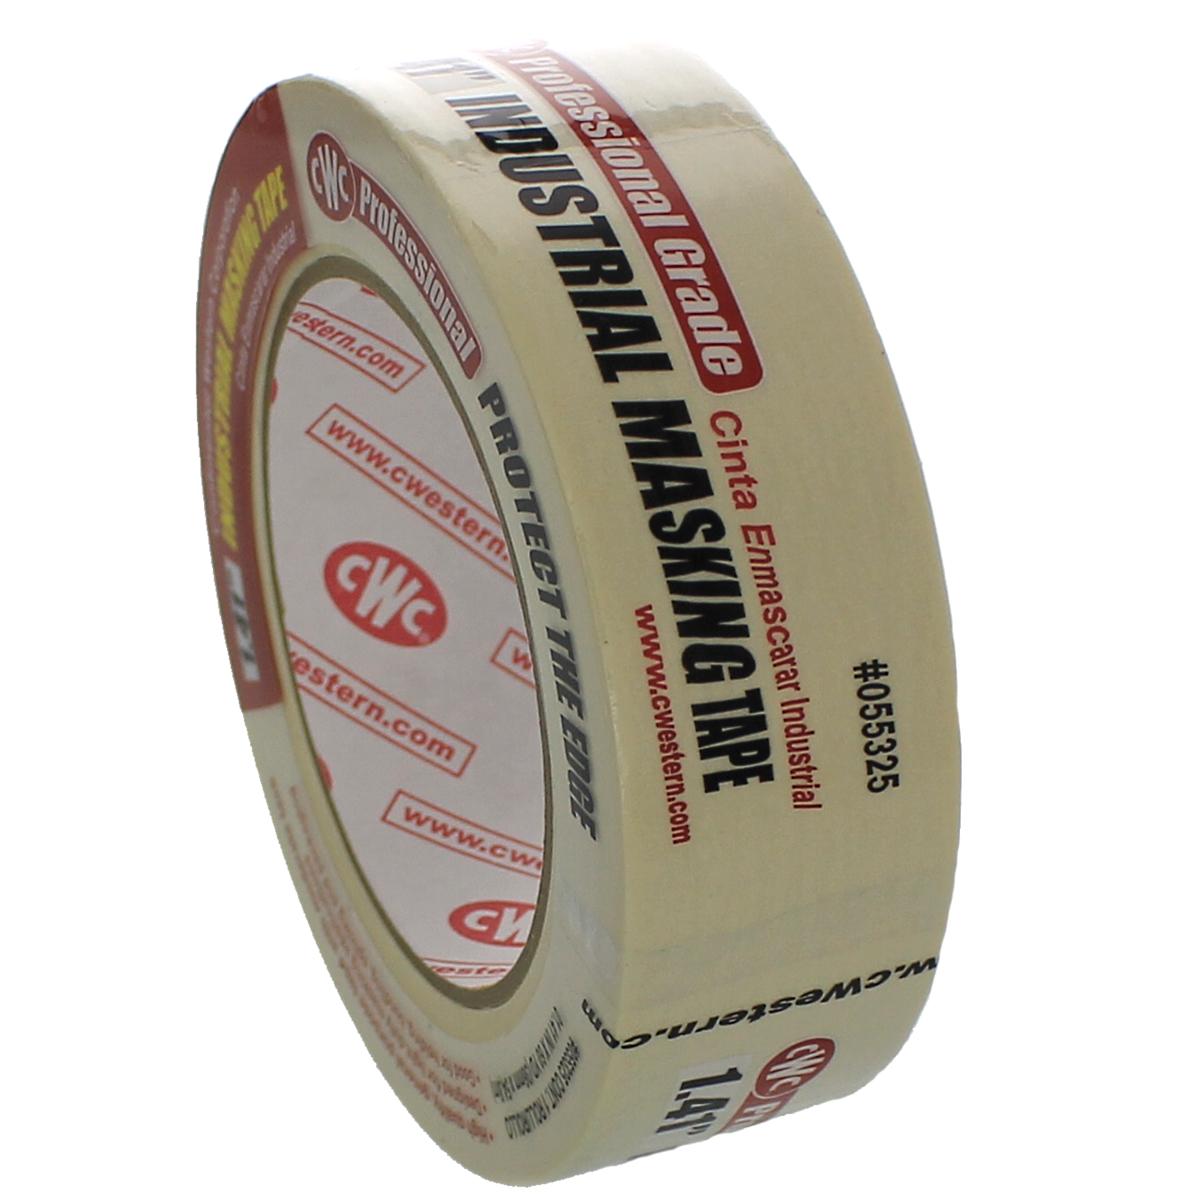 "1-1/2"" x 60 yd. Industrial Masking Tape"